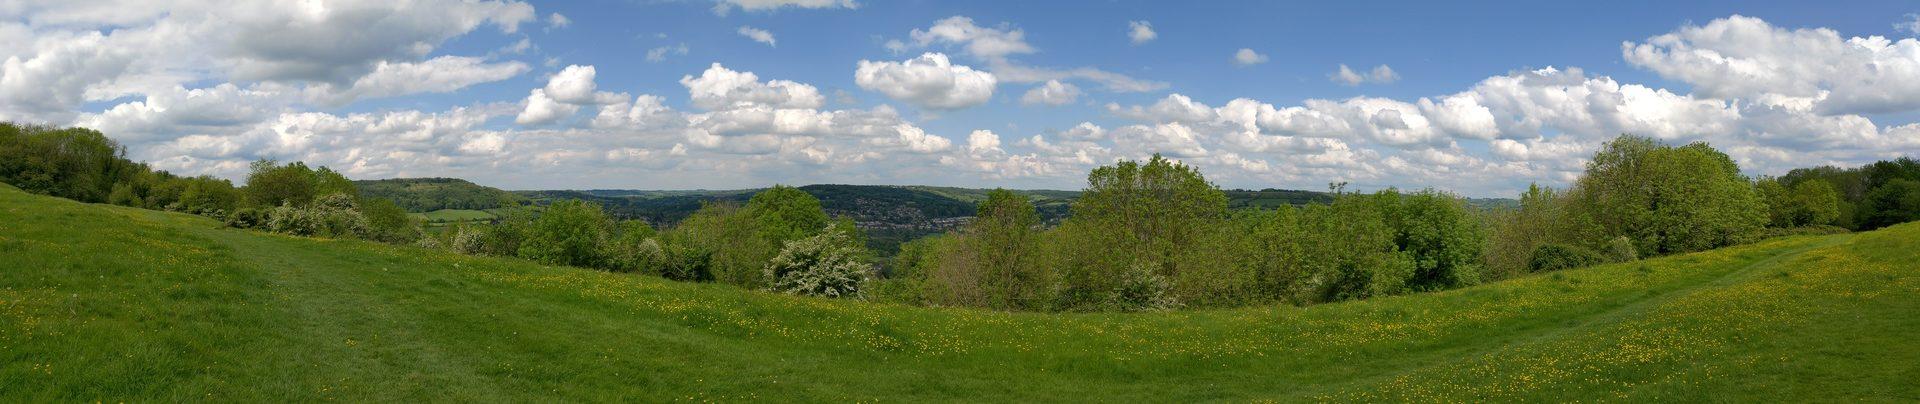 Asus Zenfone 6 sample image - Landscape panorama